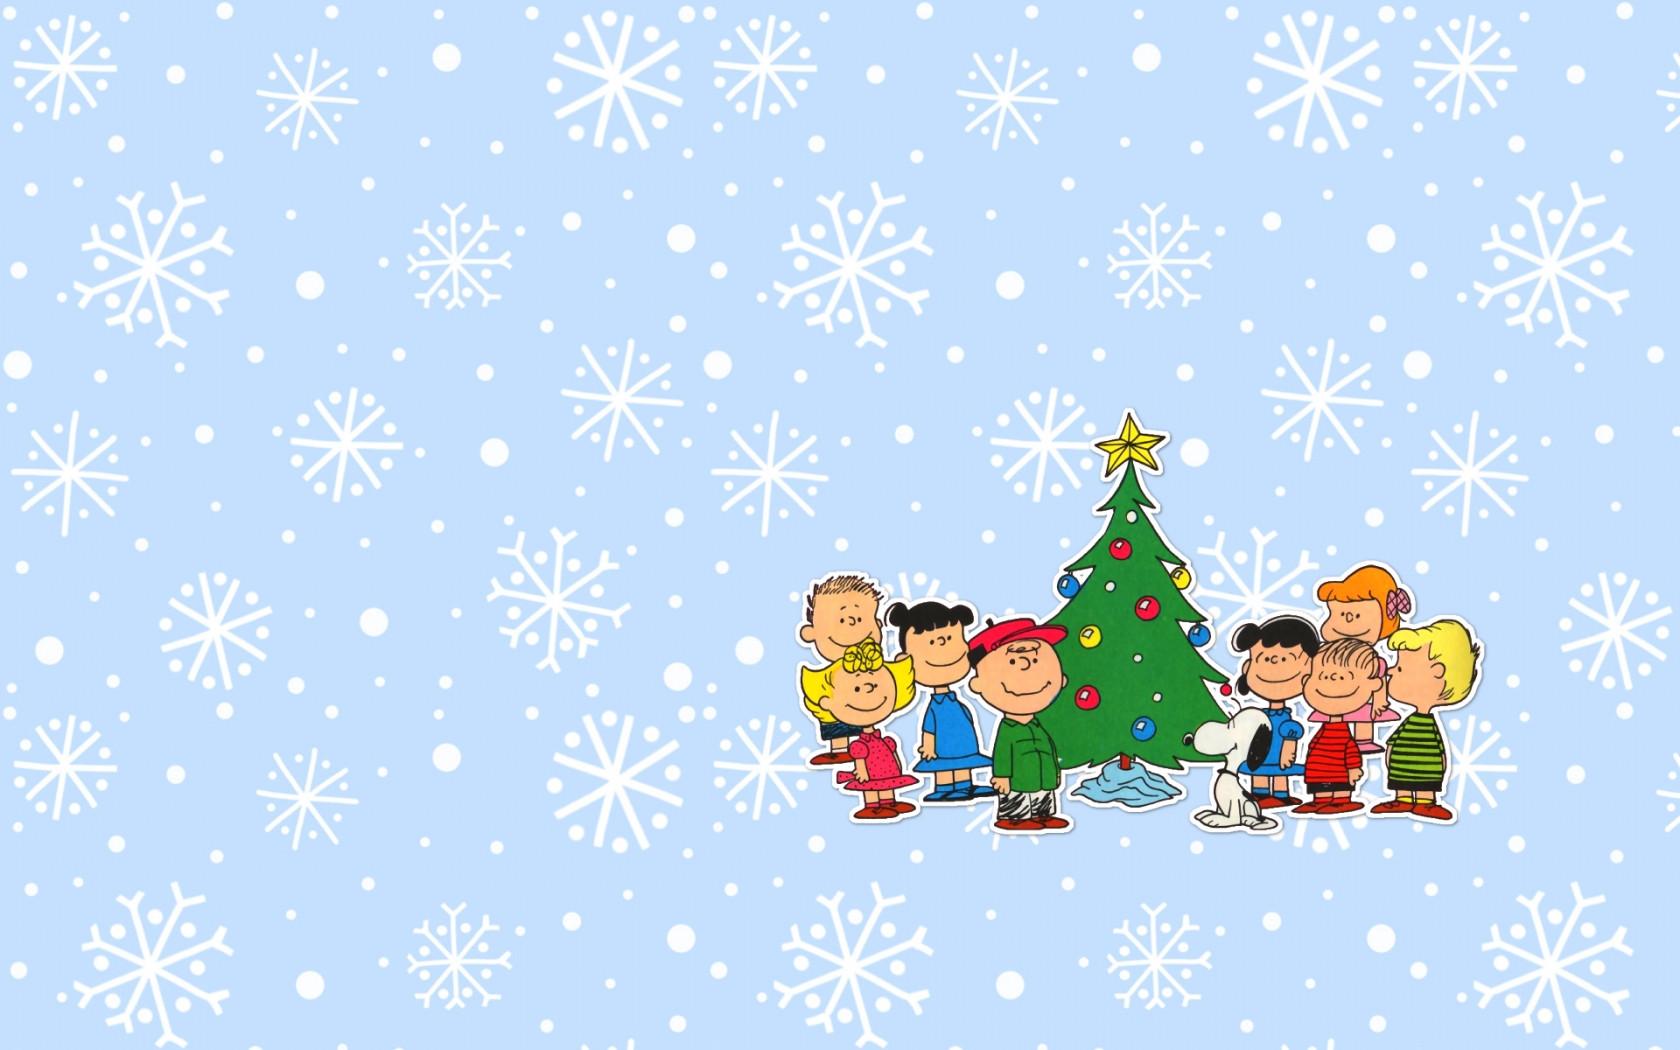 Charlie Brown Christmas Background Full Desktop Backgrounds 1680x1050